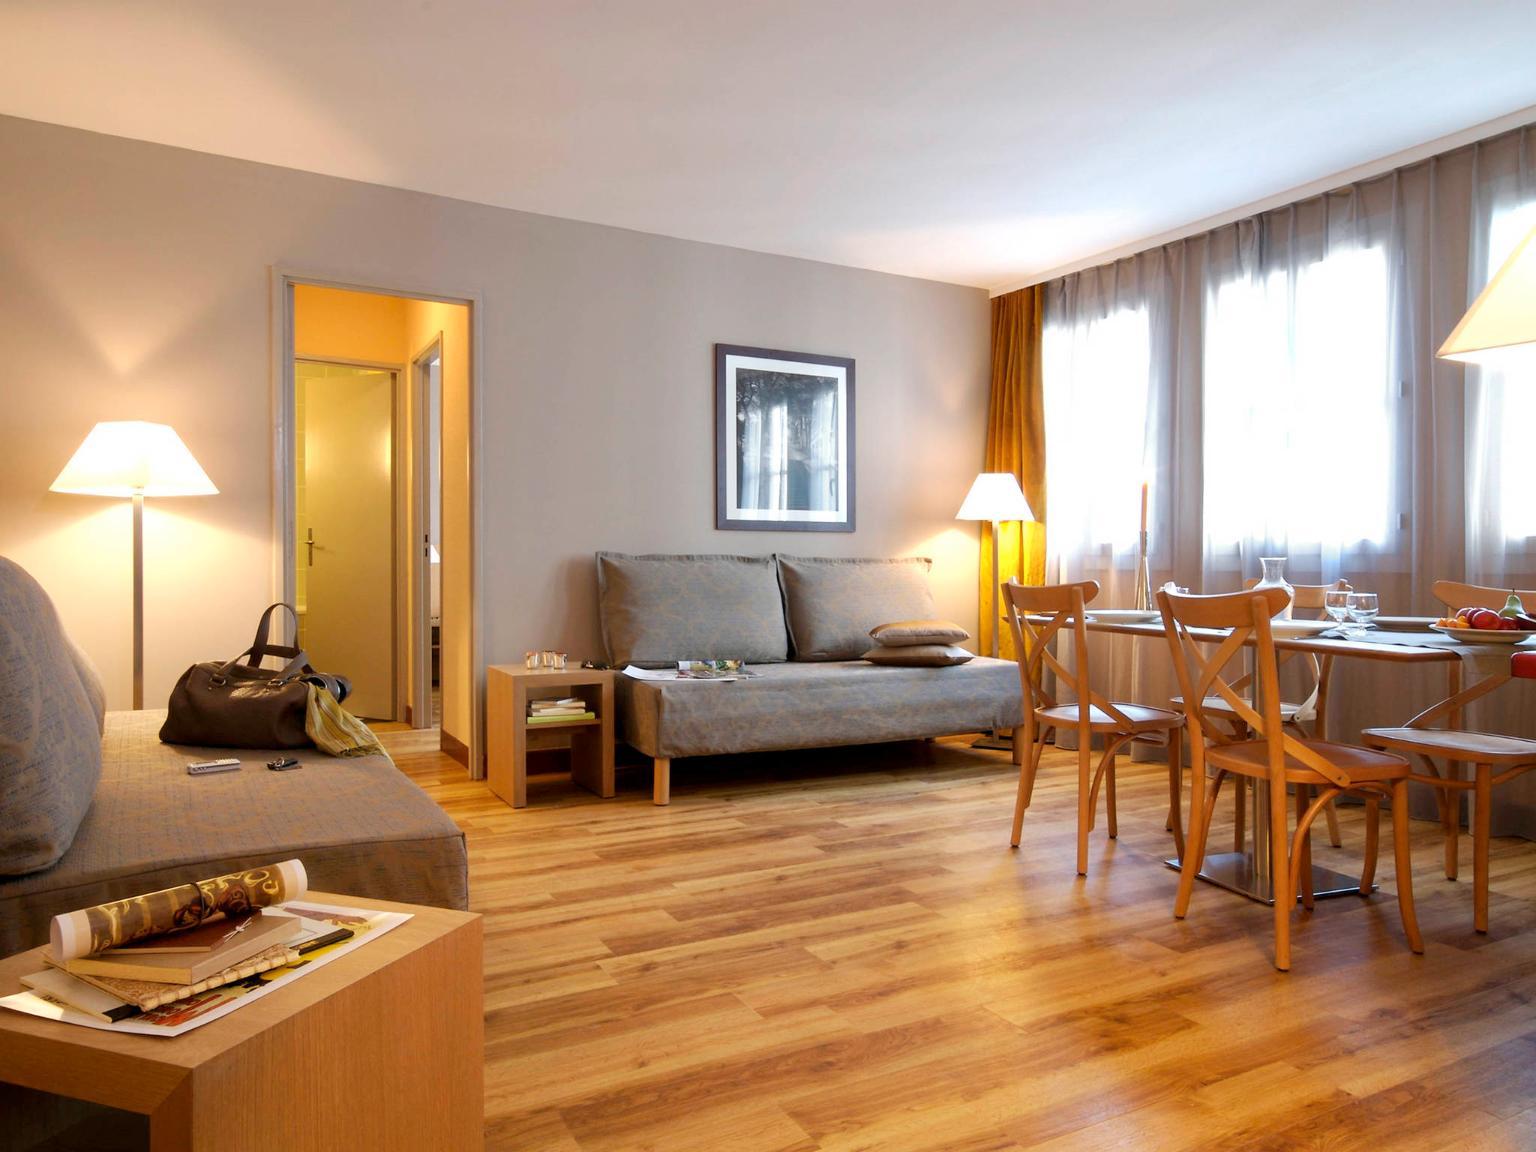 aparthotel adagio paris montmartre h tel 10 place charles dullin 75018 paris adresse horaire. Black Bedroom Furniture Sets. Home Design Ideas